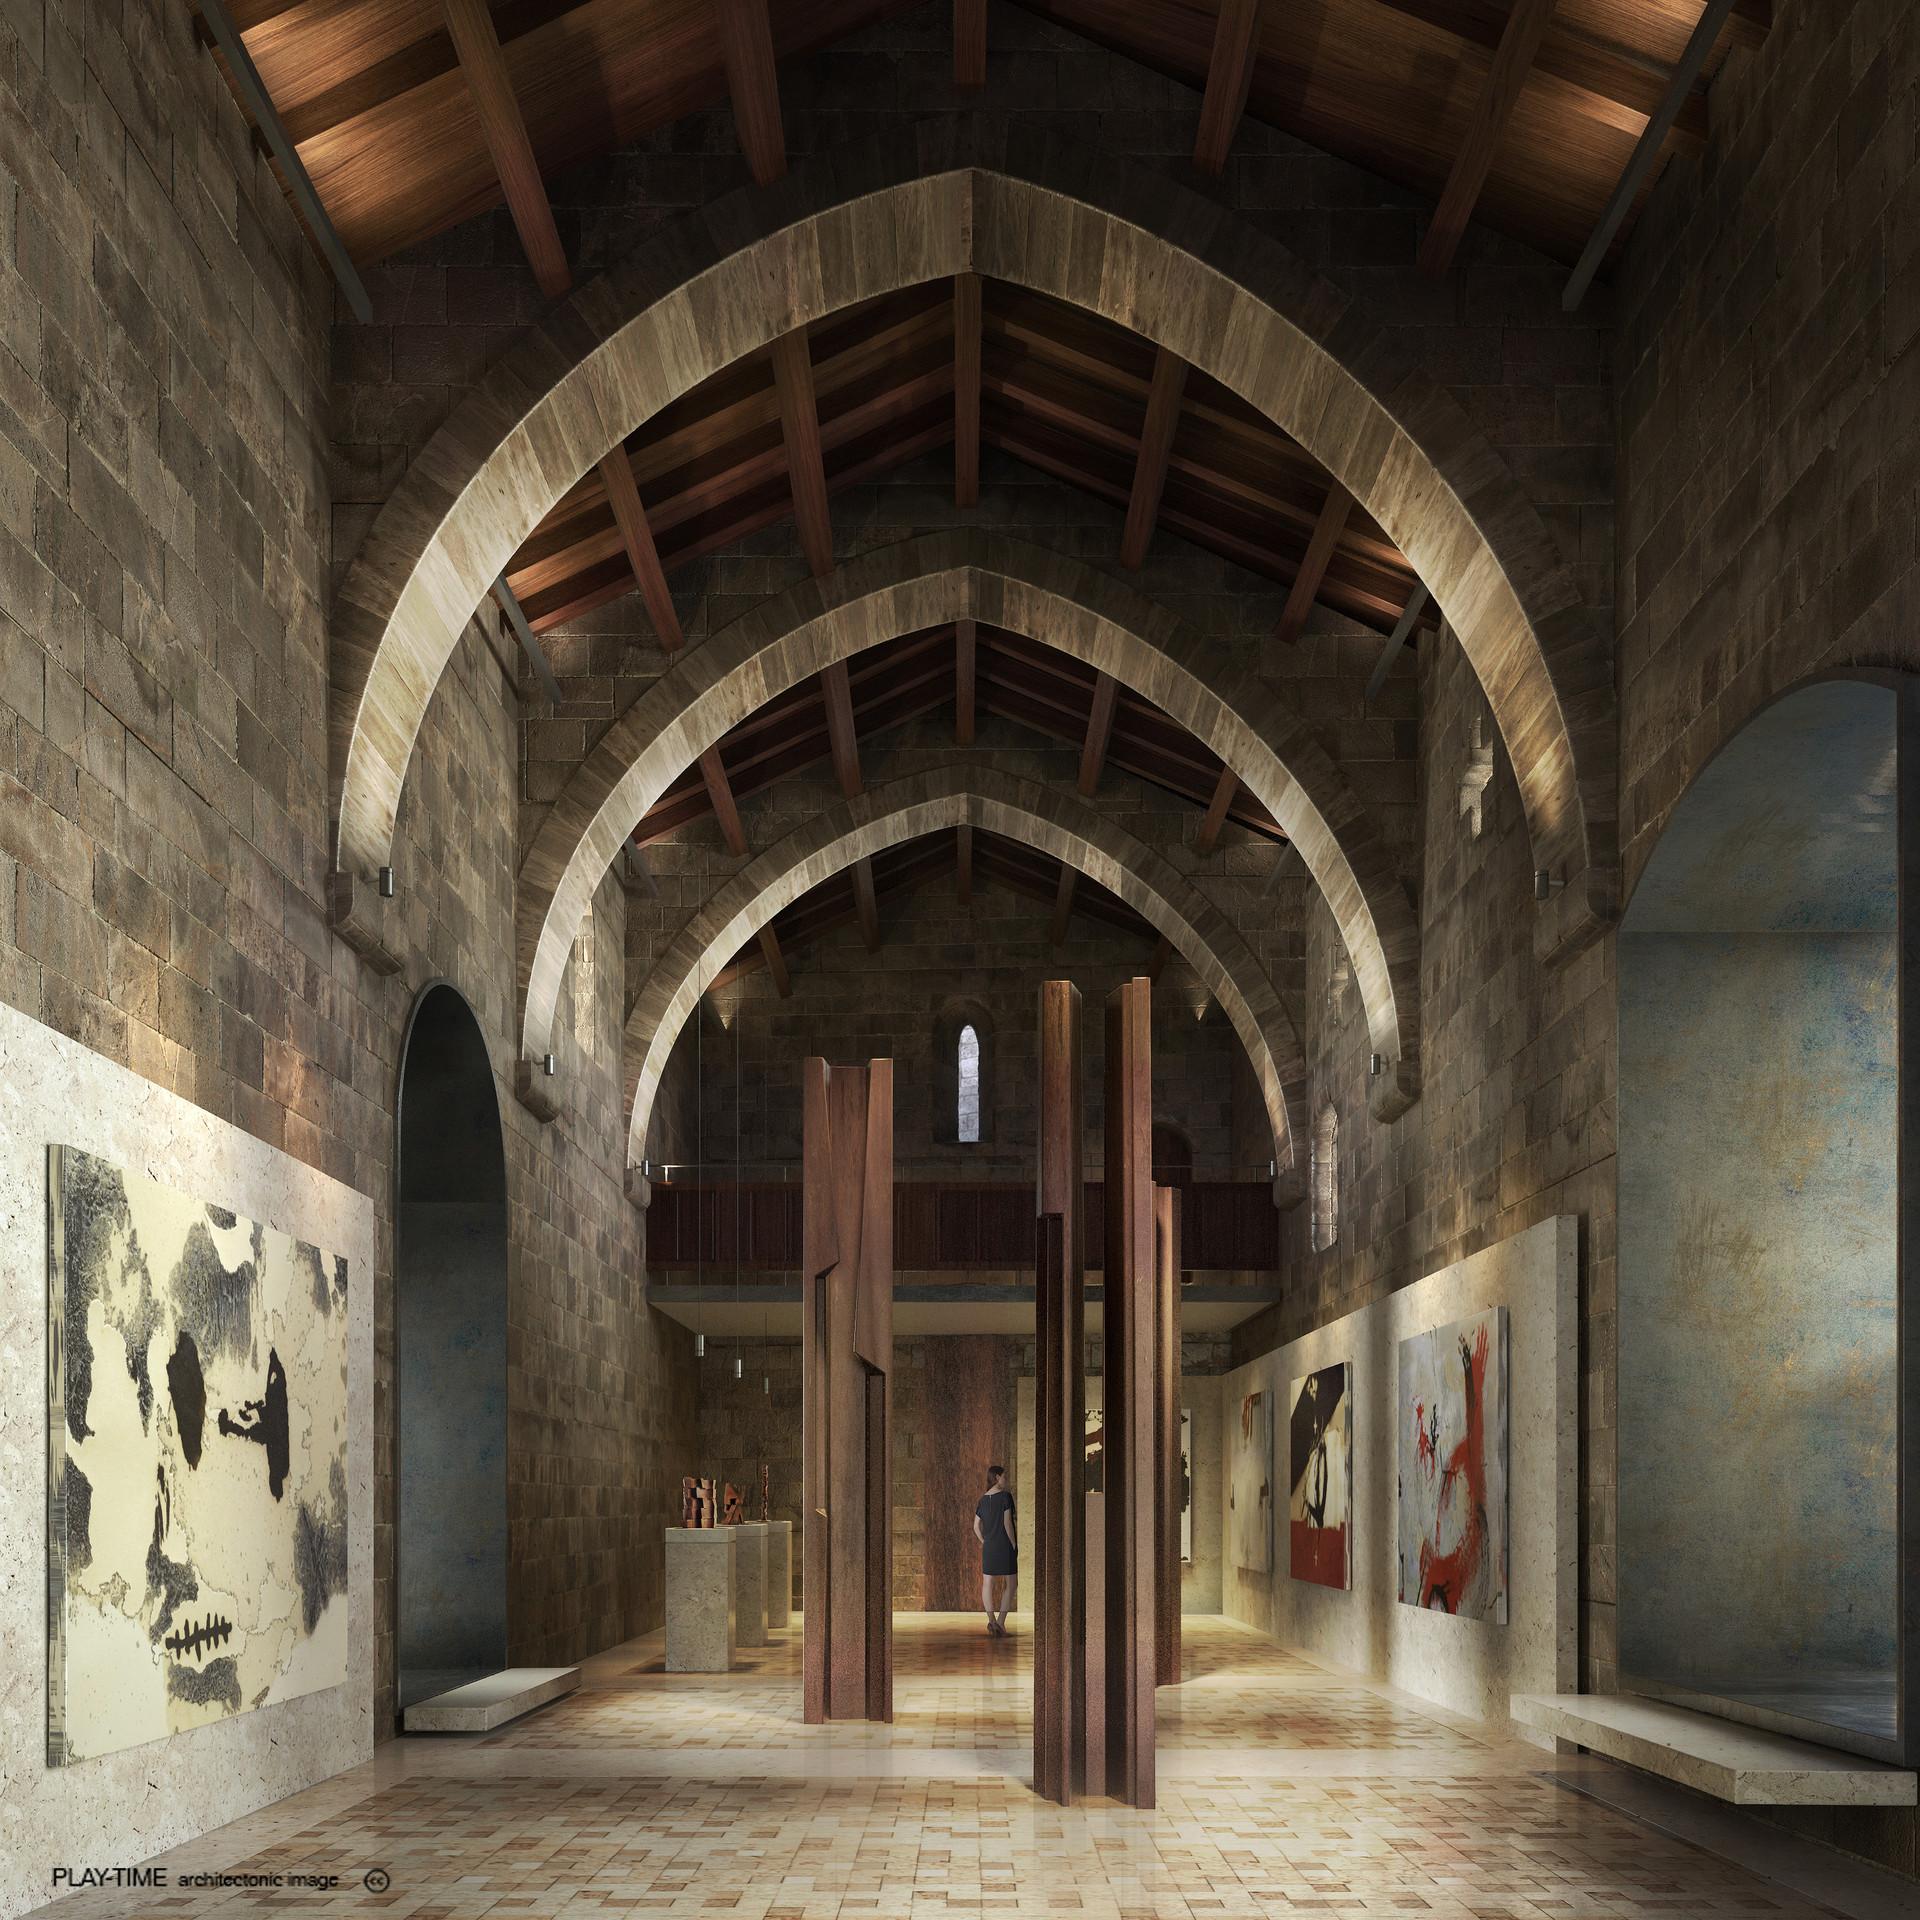 Play time architectonic image mesura rehabilitacio del castell de peratellada 02